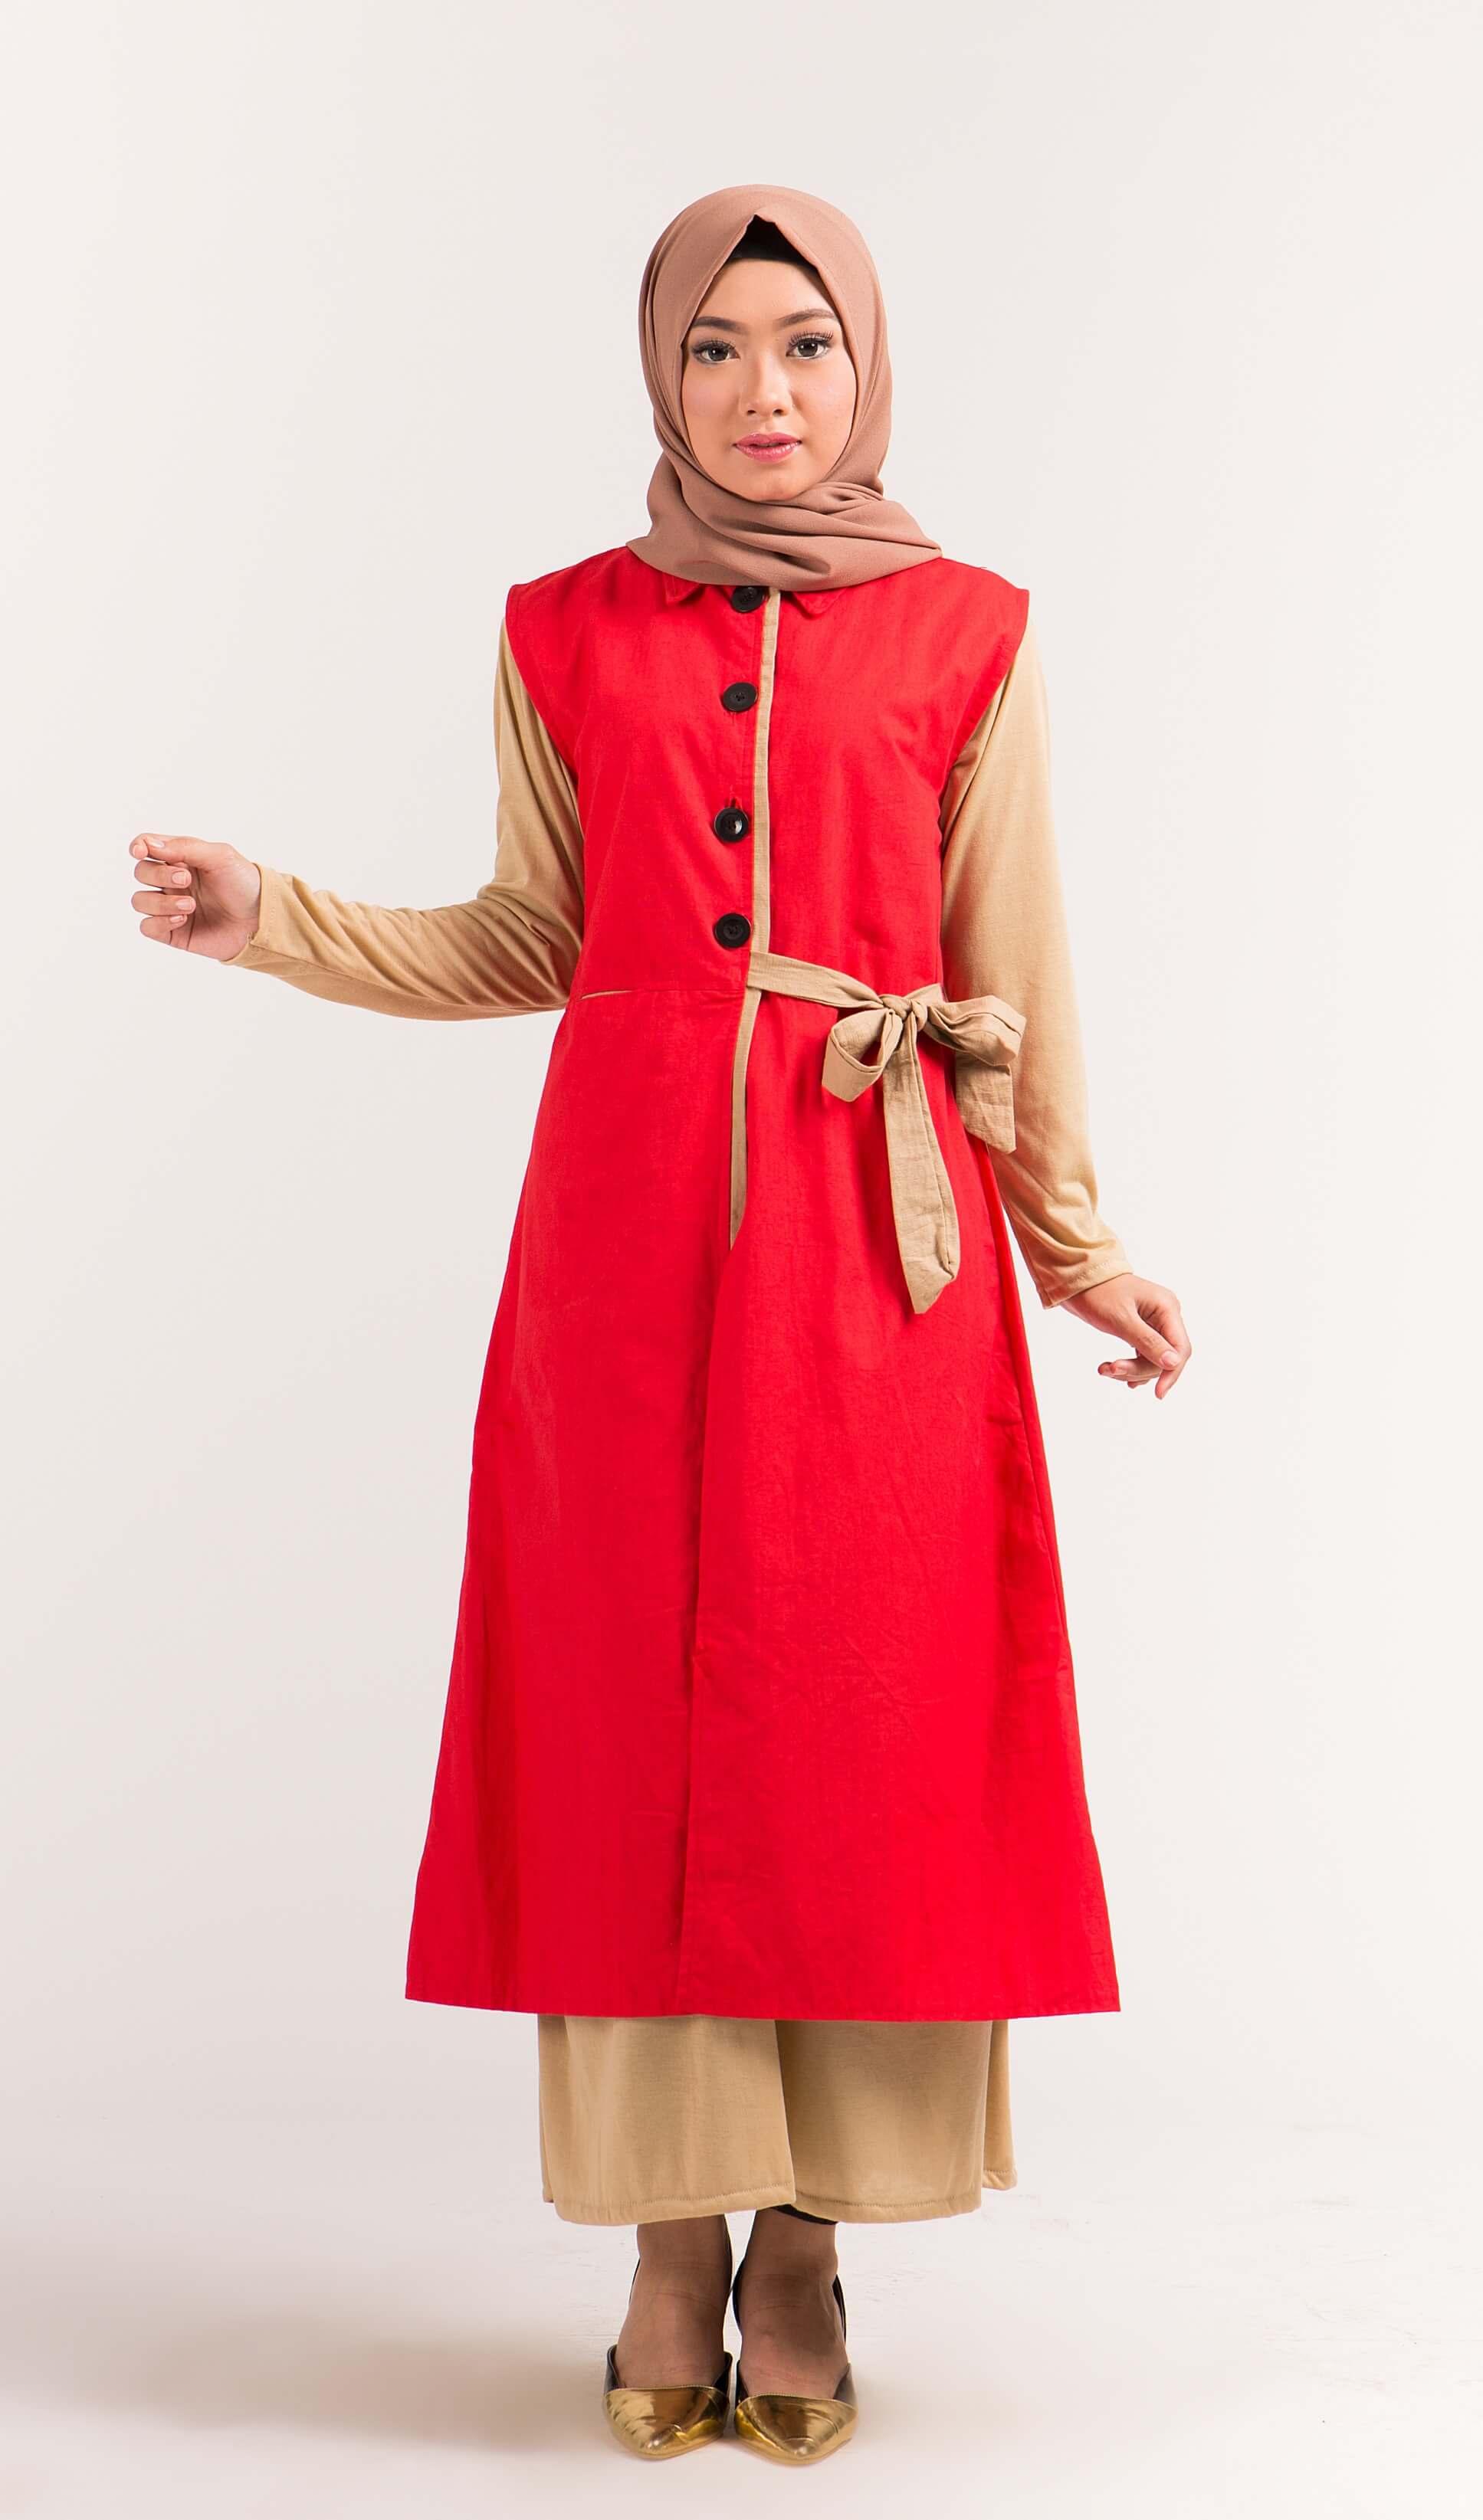 Indonesian fashion online shop 22